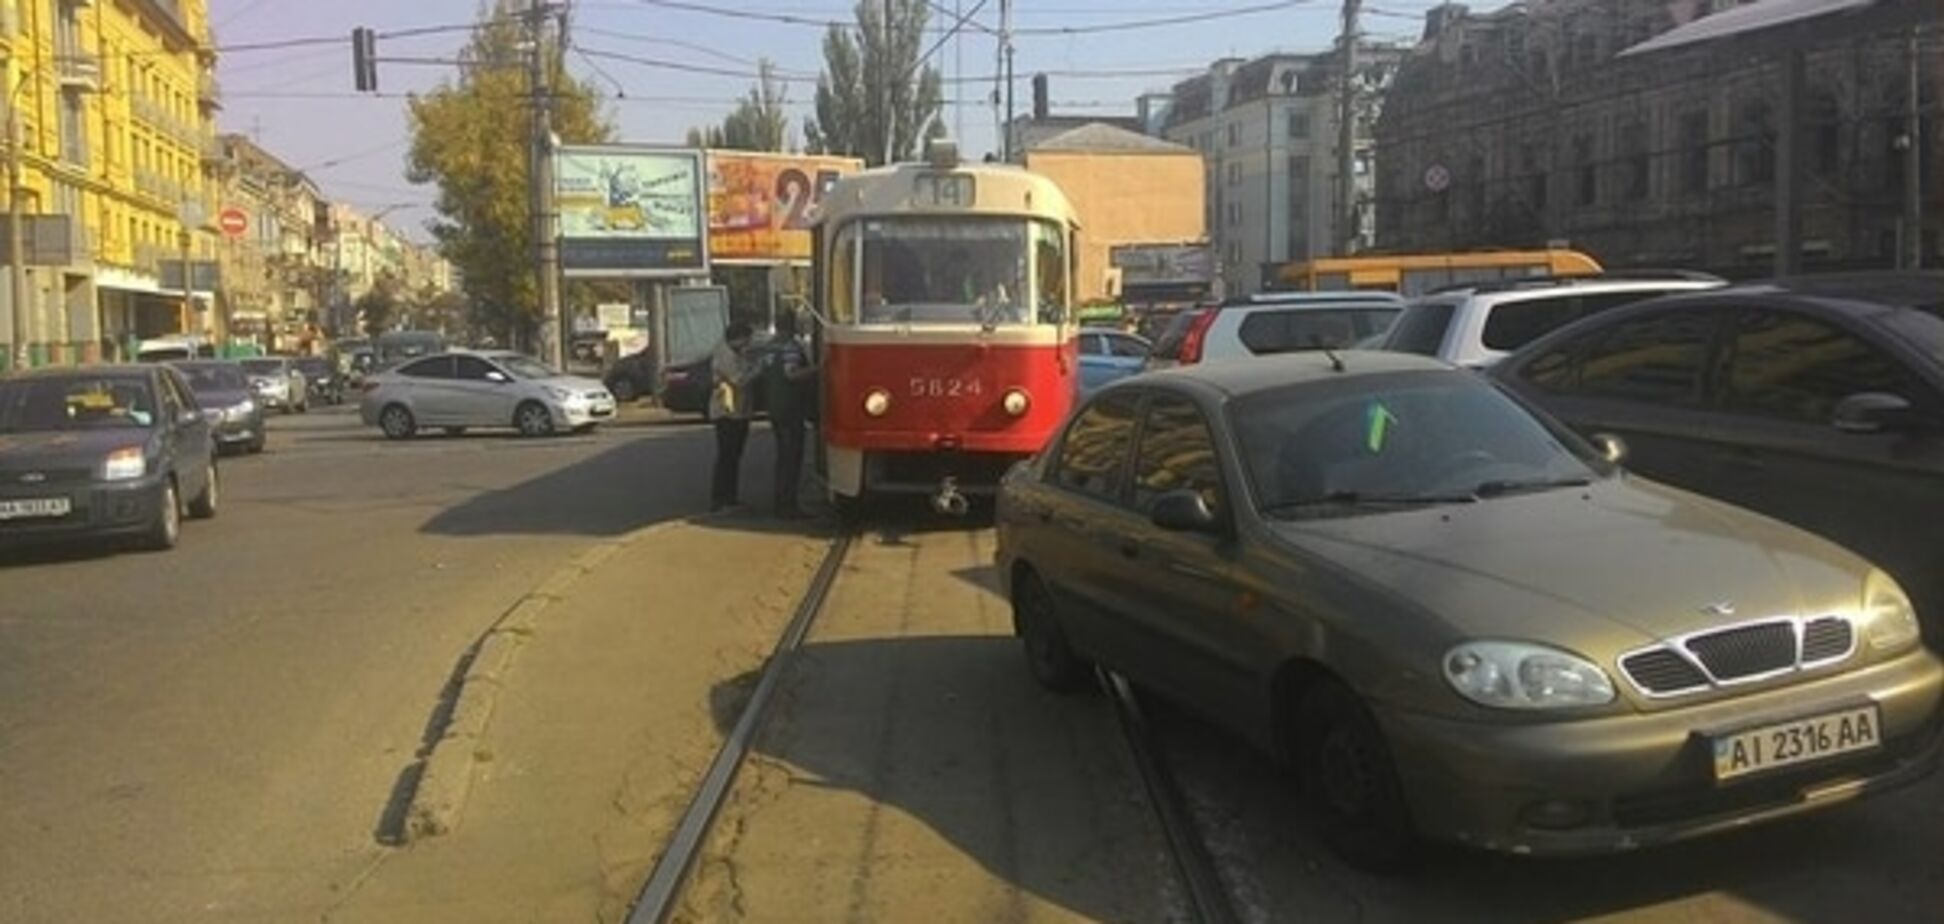 В Киеве провинциал заблокировал движение трамваев: фото нарушителя